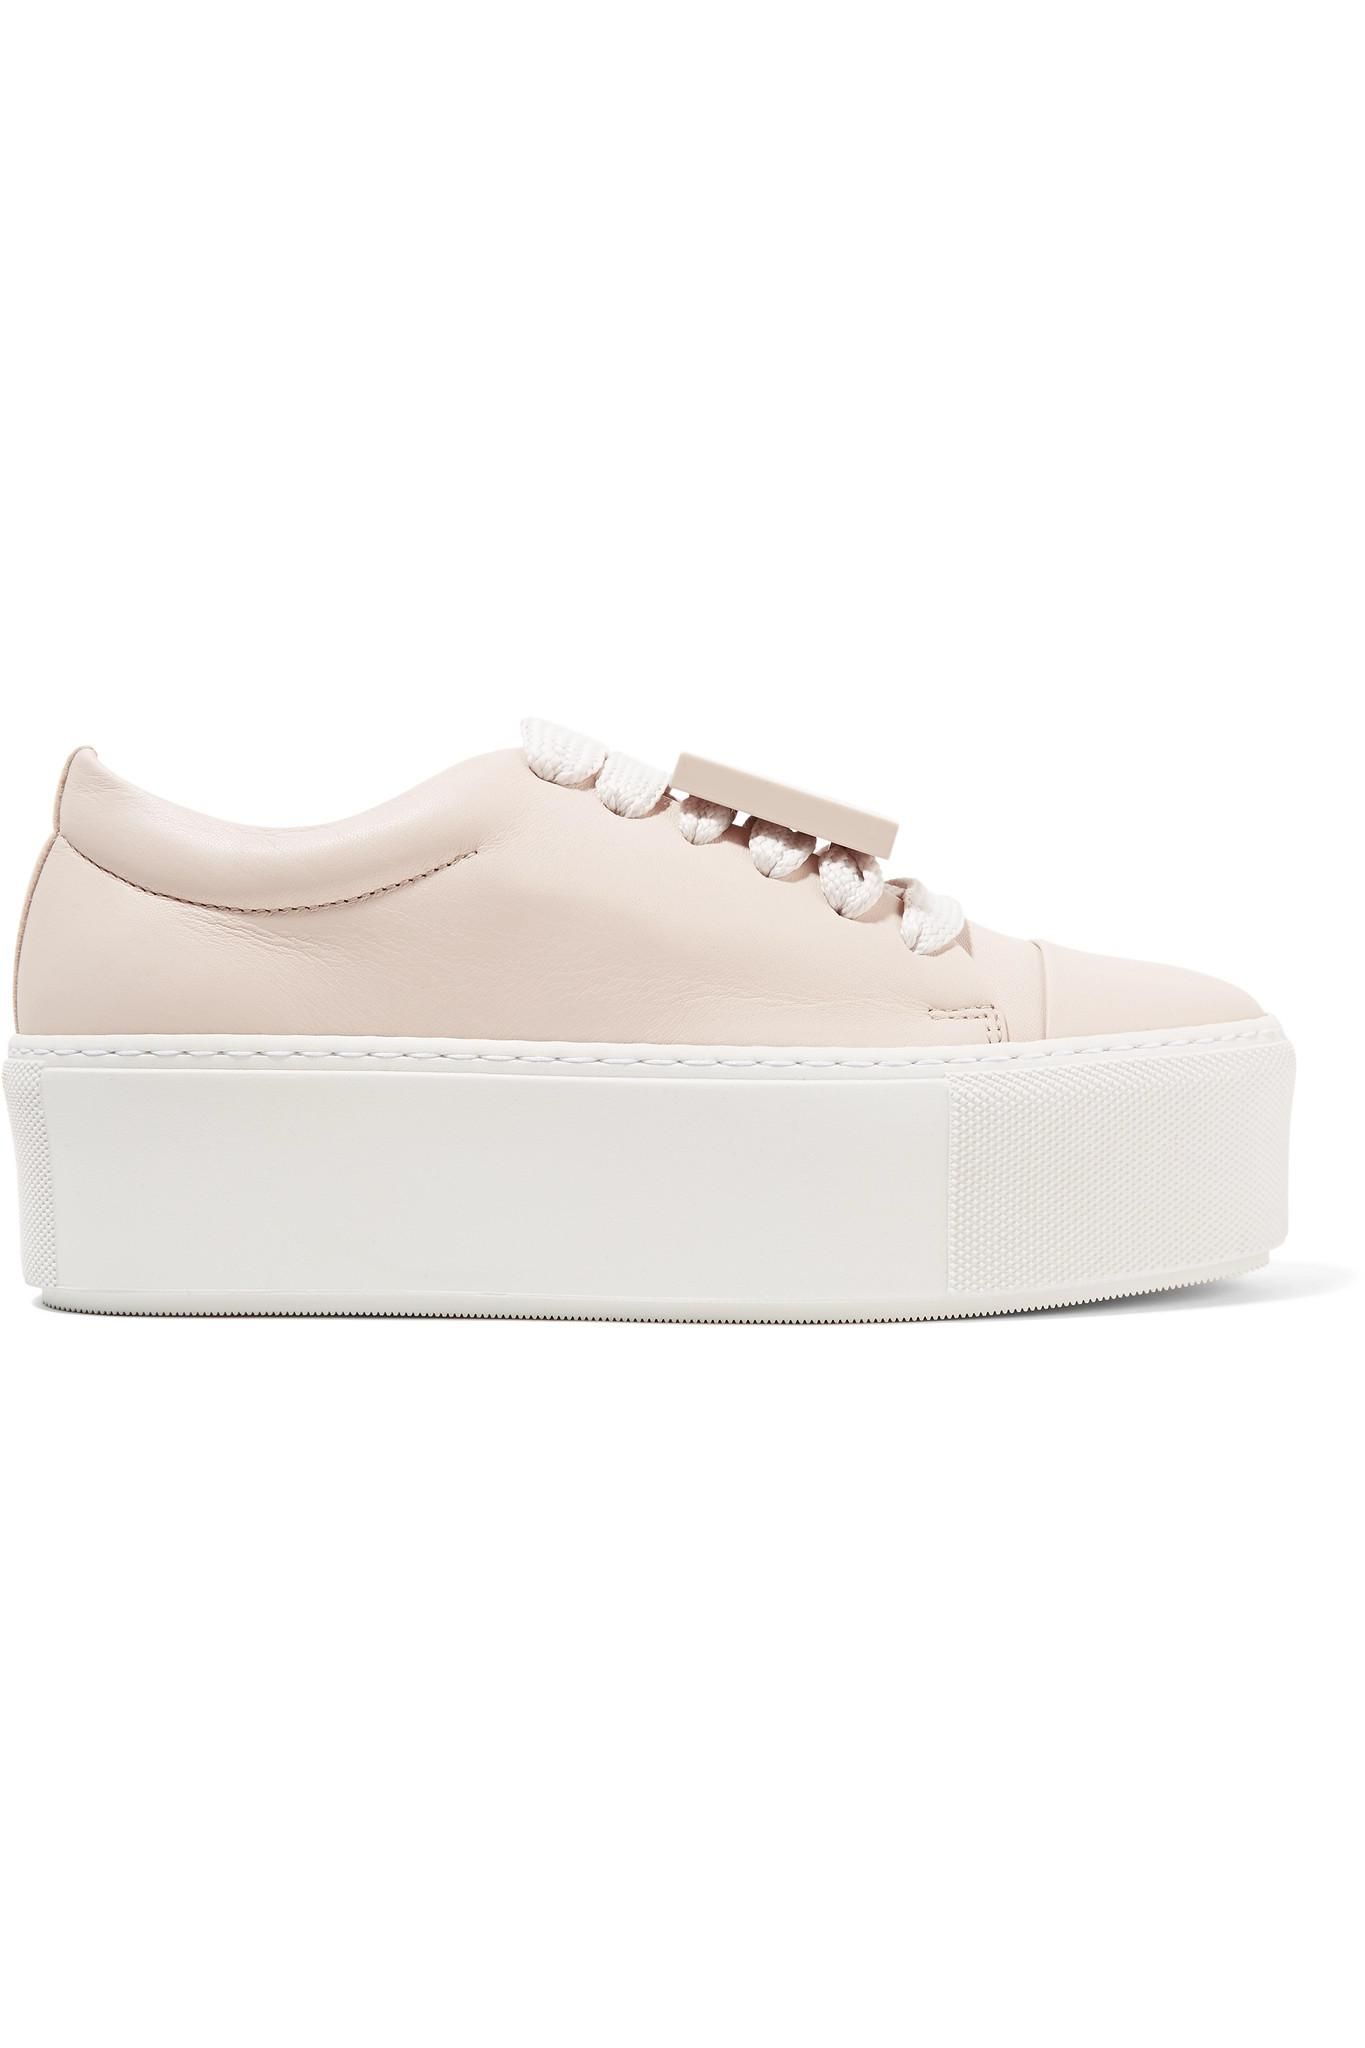 Acne Drihanna Plaque-detailed Leather Platform Sneakers - Pastel Pick A Best Cheap Price wA0FkuDwx8